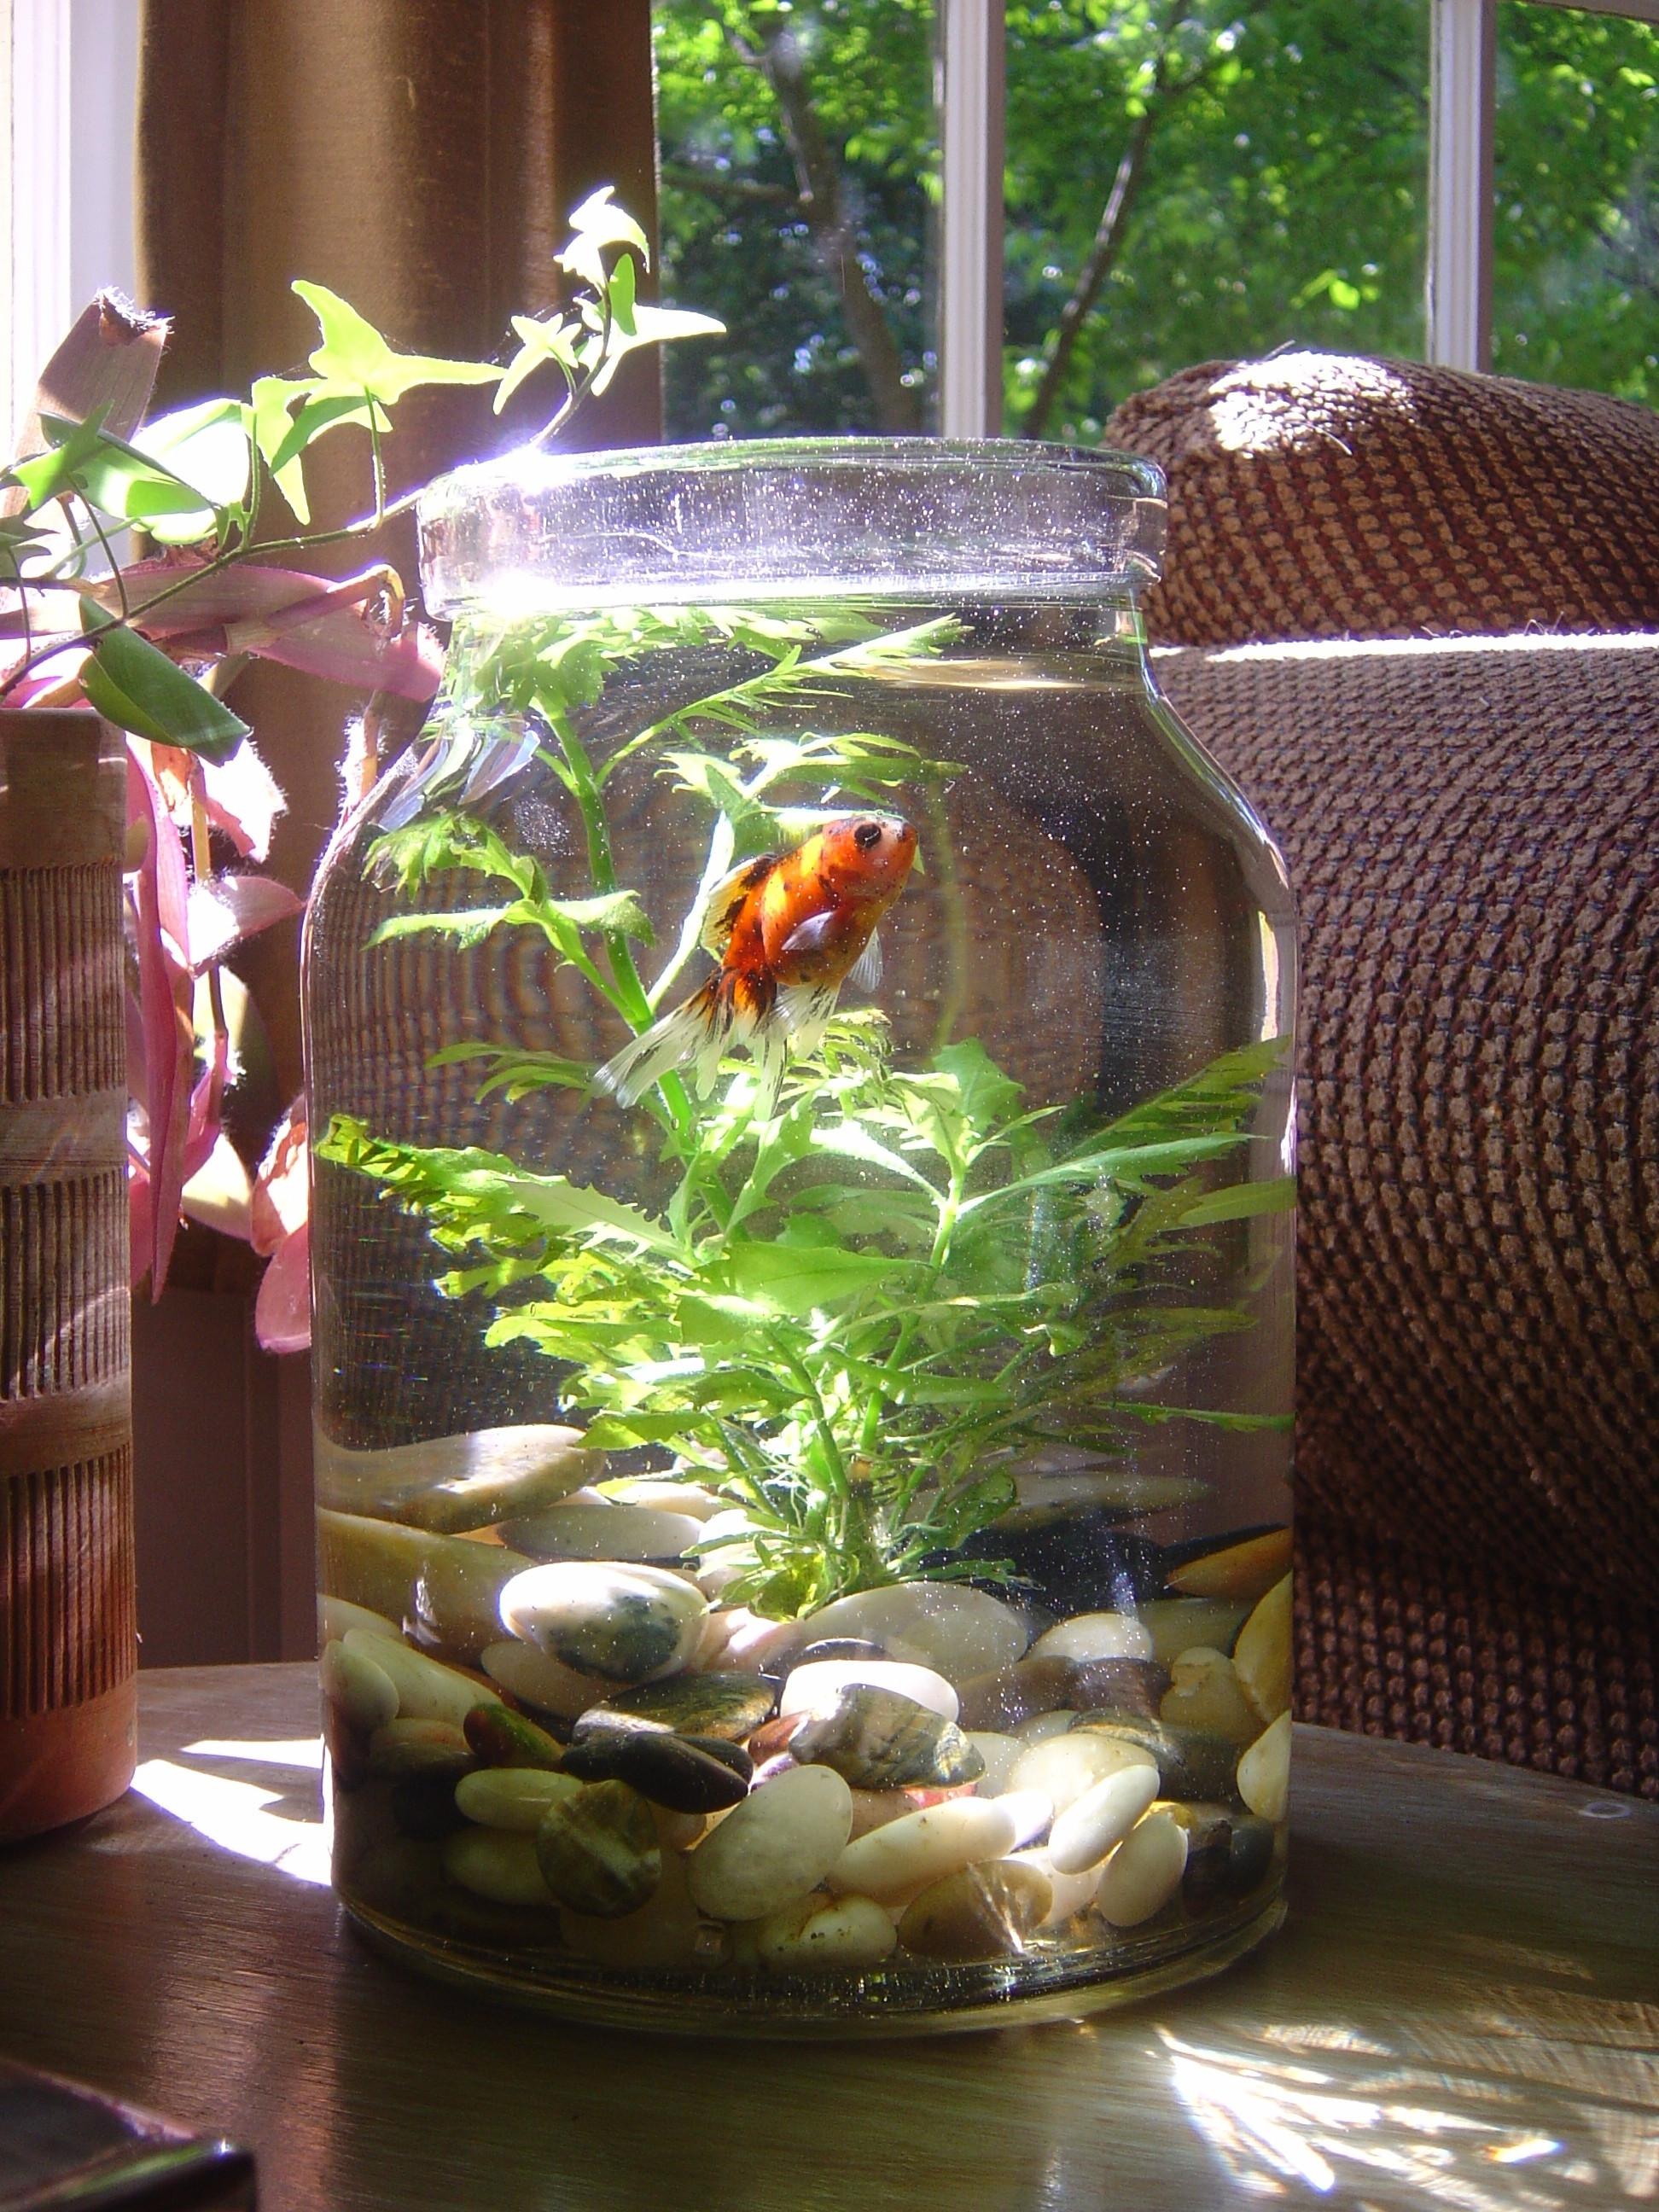 plants for bettas in a vase of creative betta fish bowl ideas regarding creative betta fish bowl ideas photo8